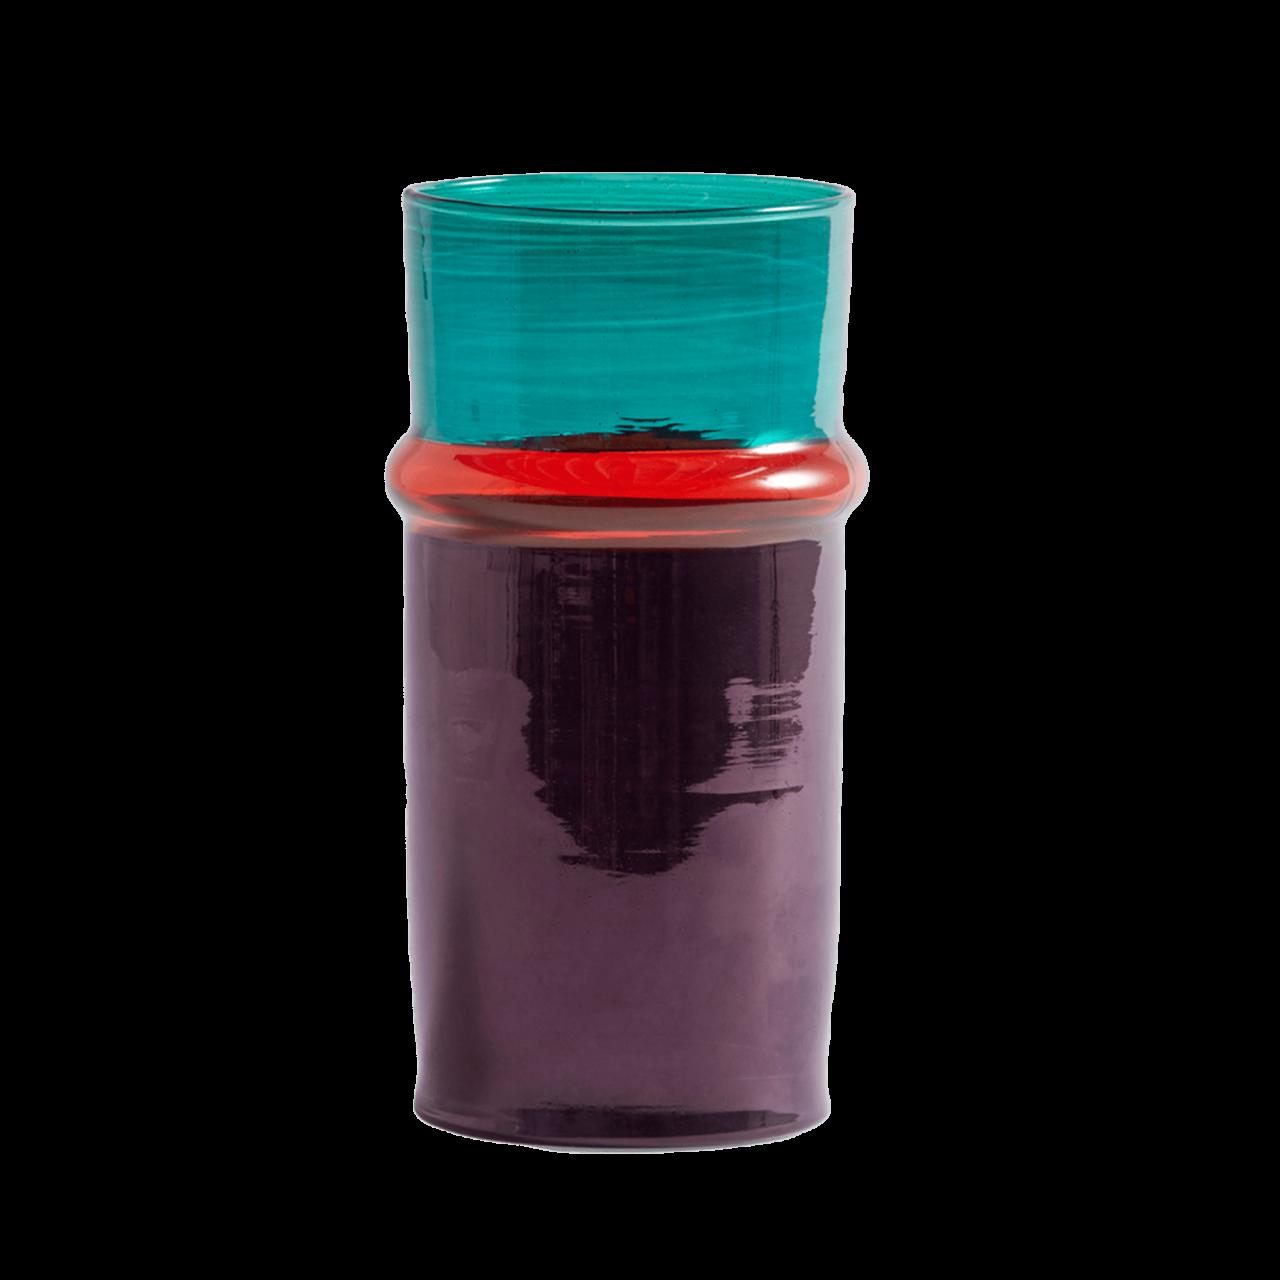 Morroccan Vase S